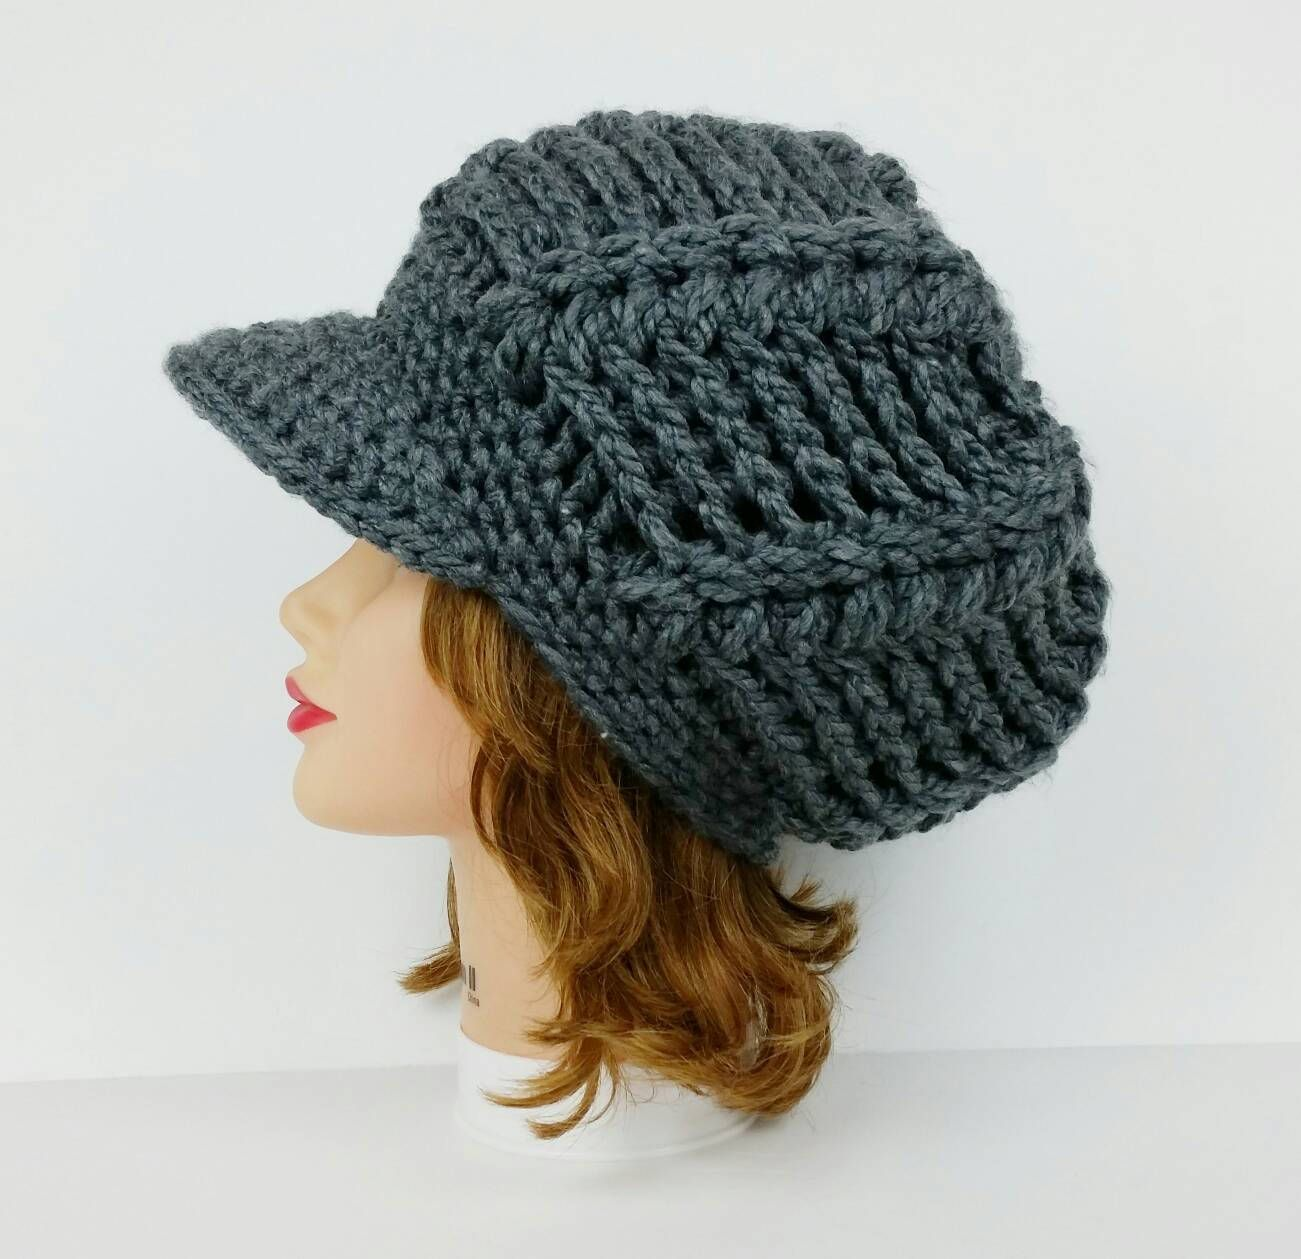 Crochet Newsboy Cap Visor Hat Chunky Beanie With Brim Etsy Crochet Hat For Women Crochet Hats Crochet